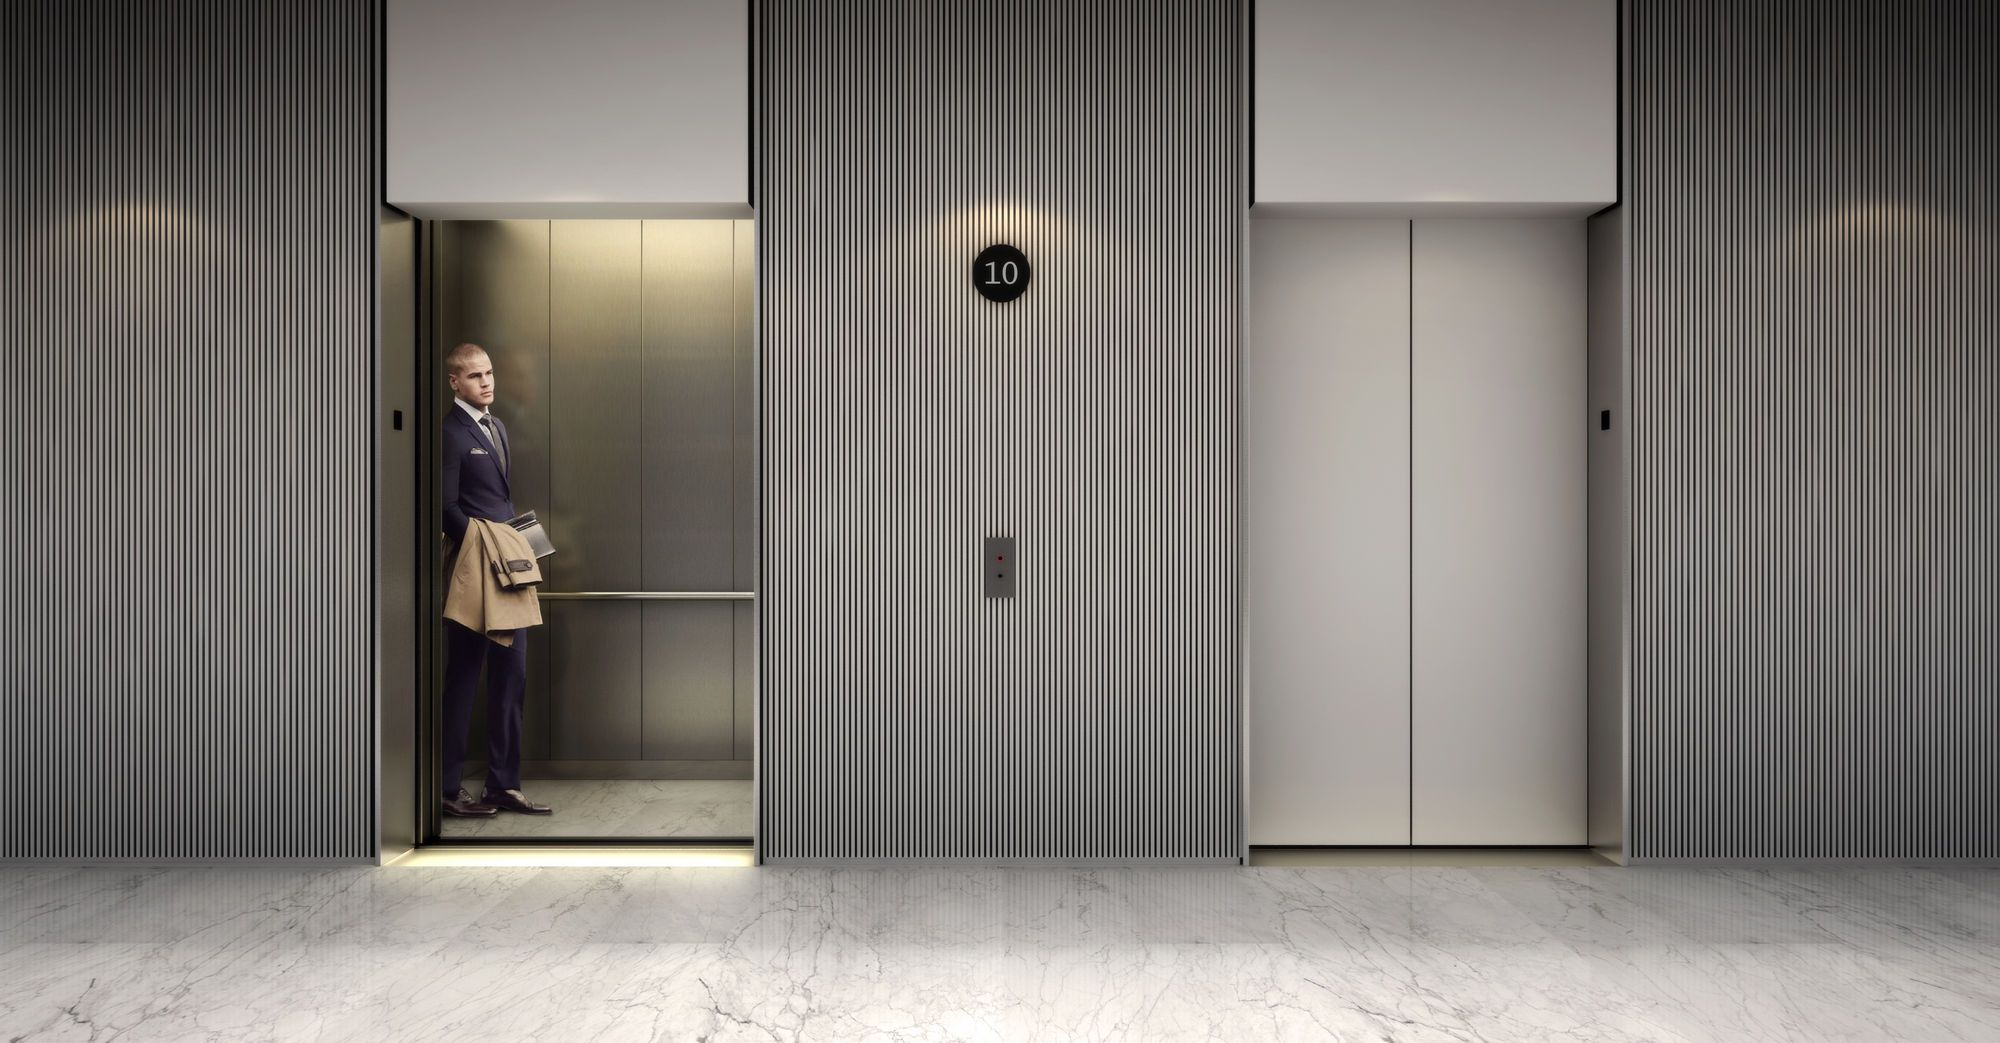 lift lobby design - Google Search